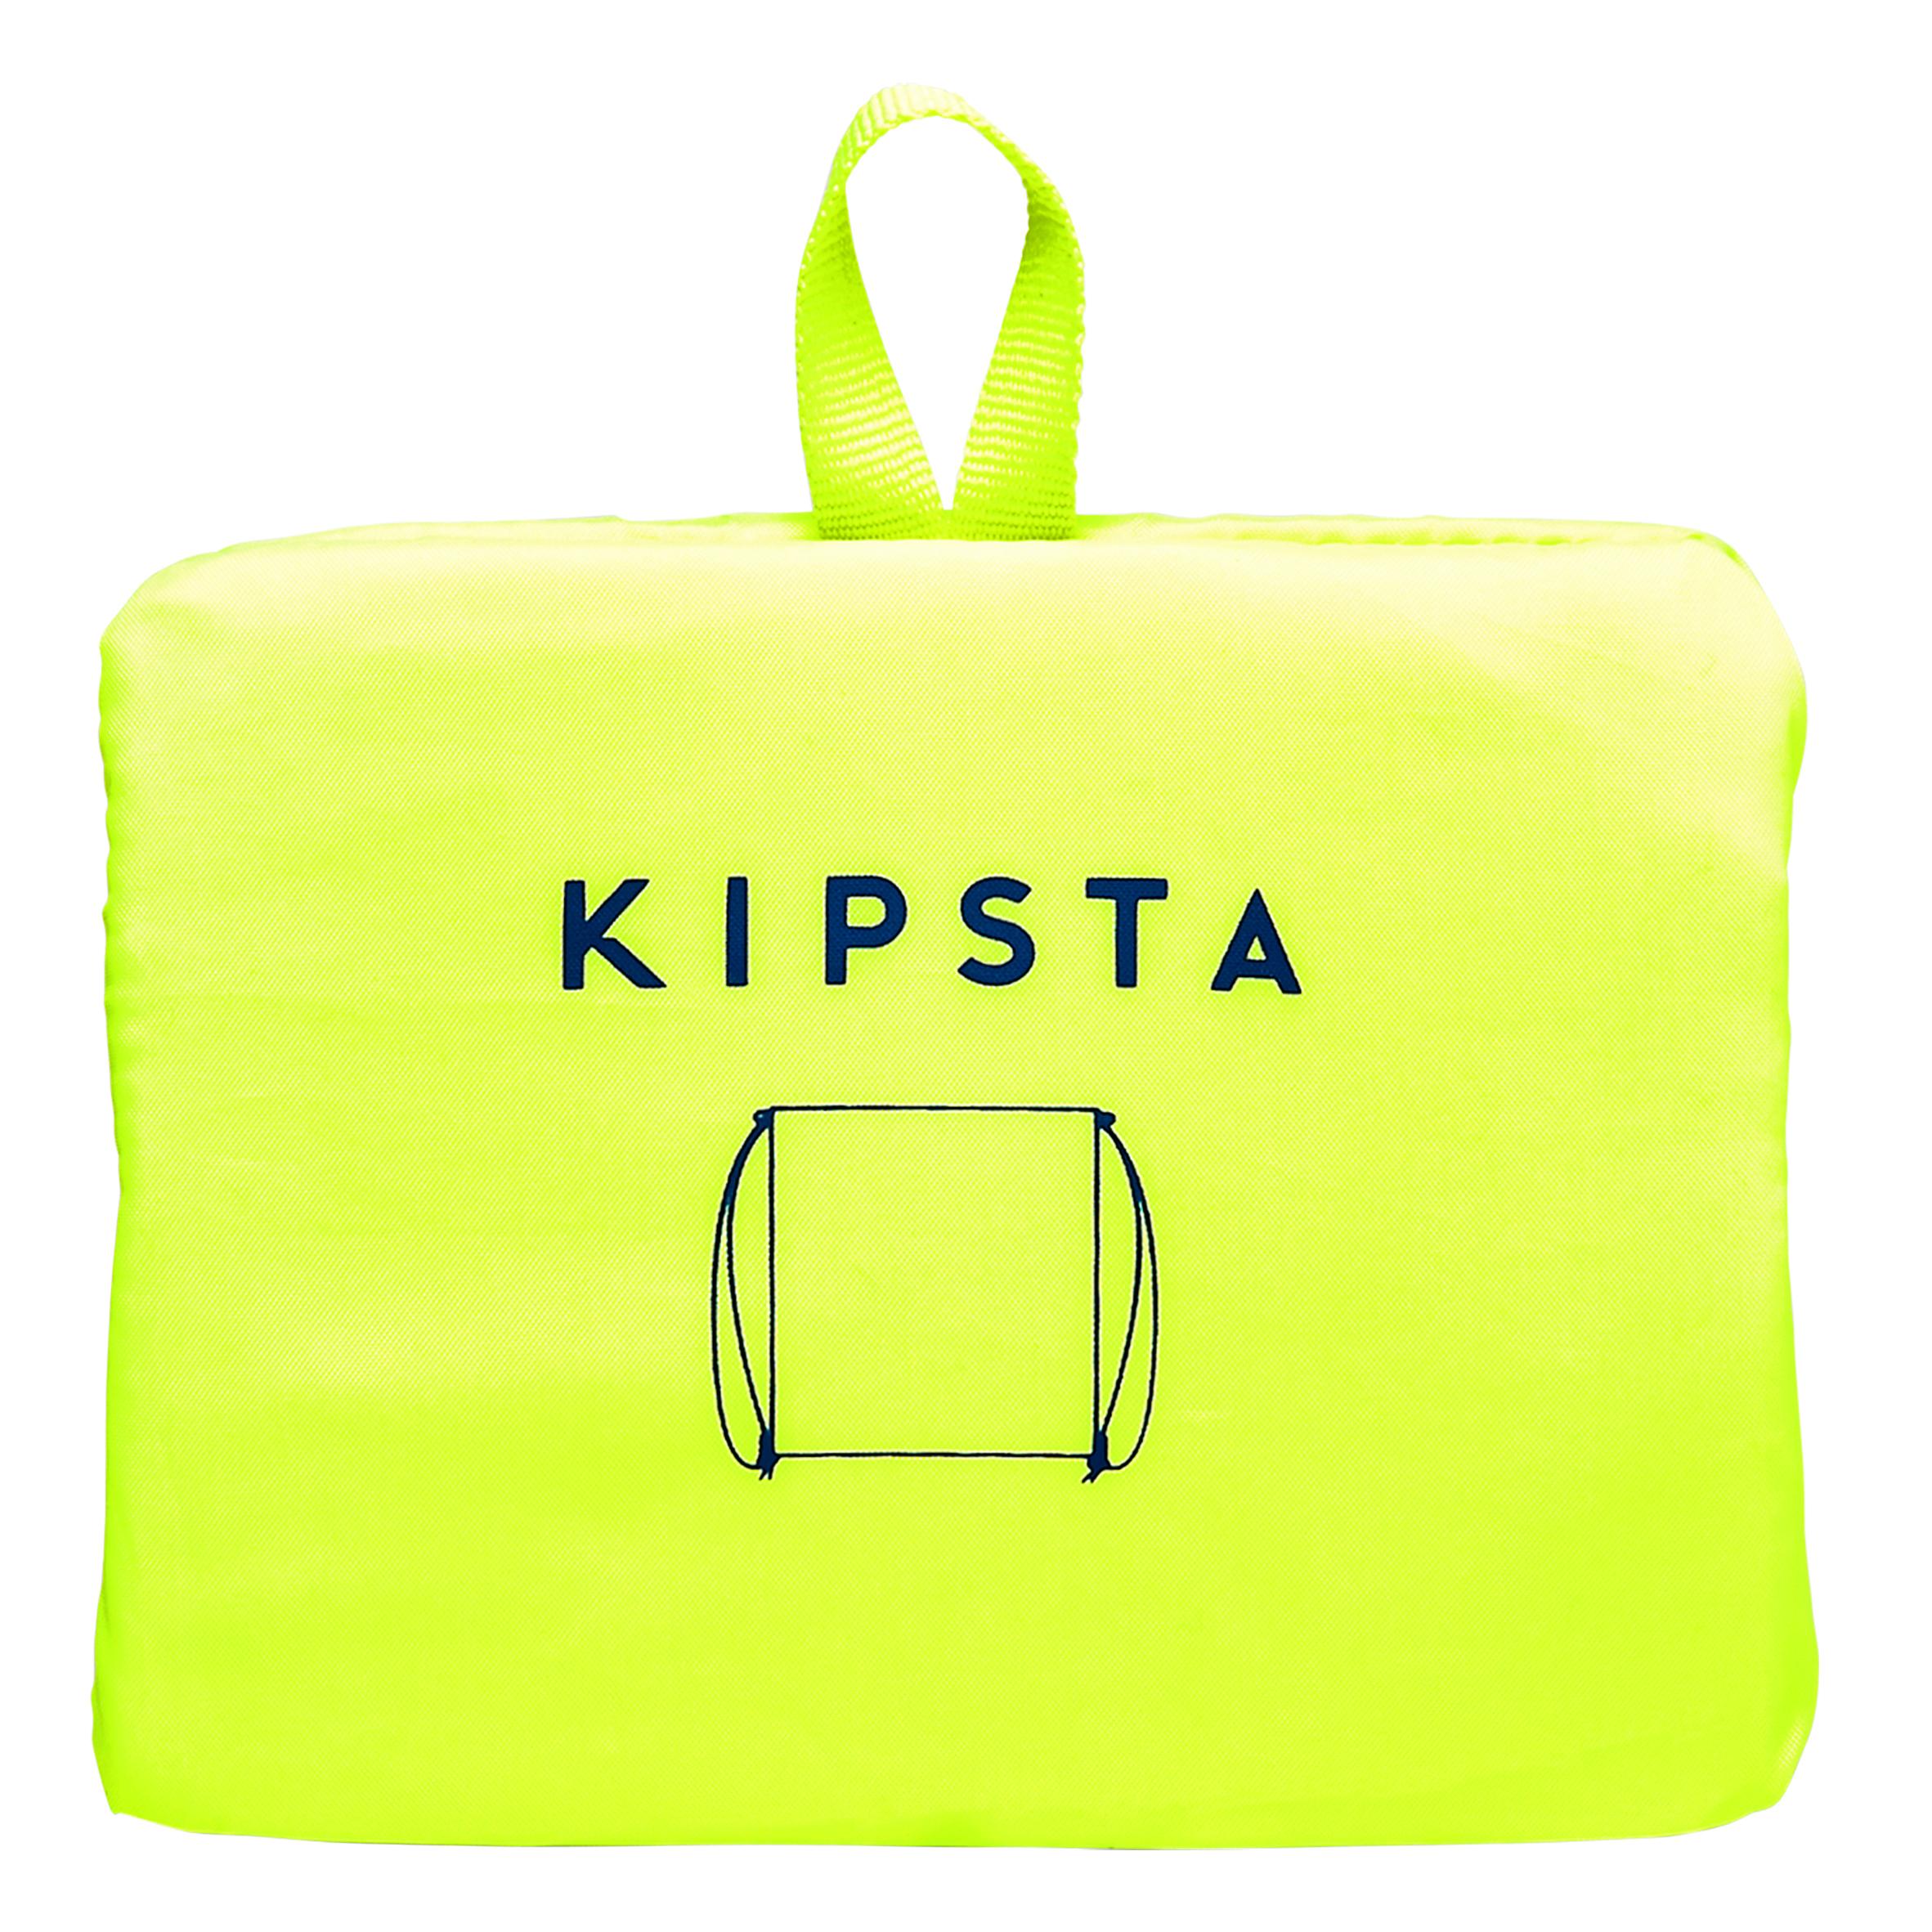 Kipsta Light Jaune Bleu Ss19 - 001 --- Expires On 08-12-2032.jpg